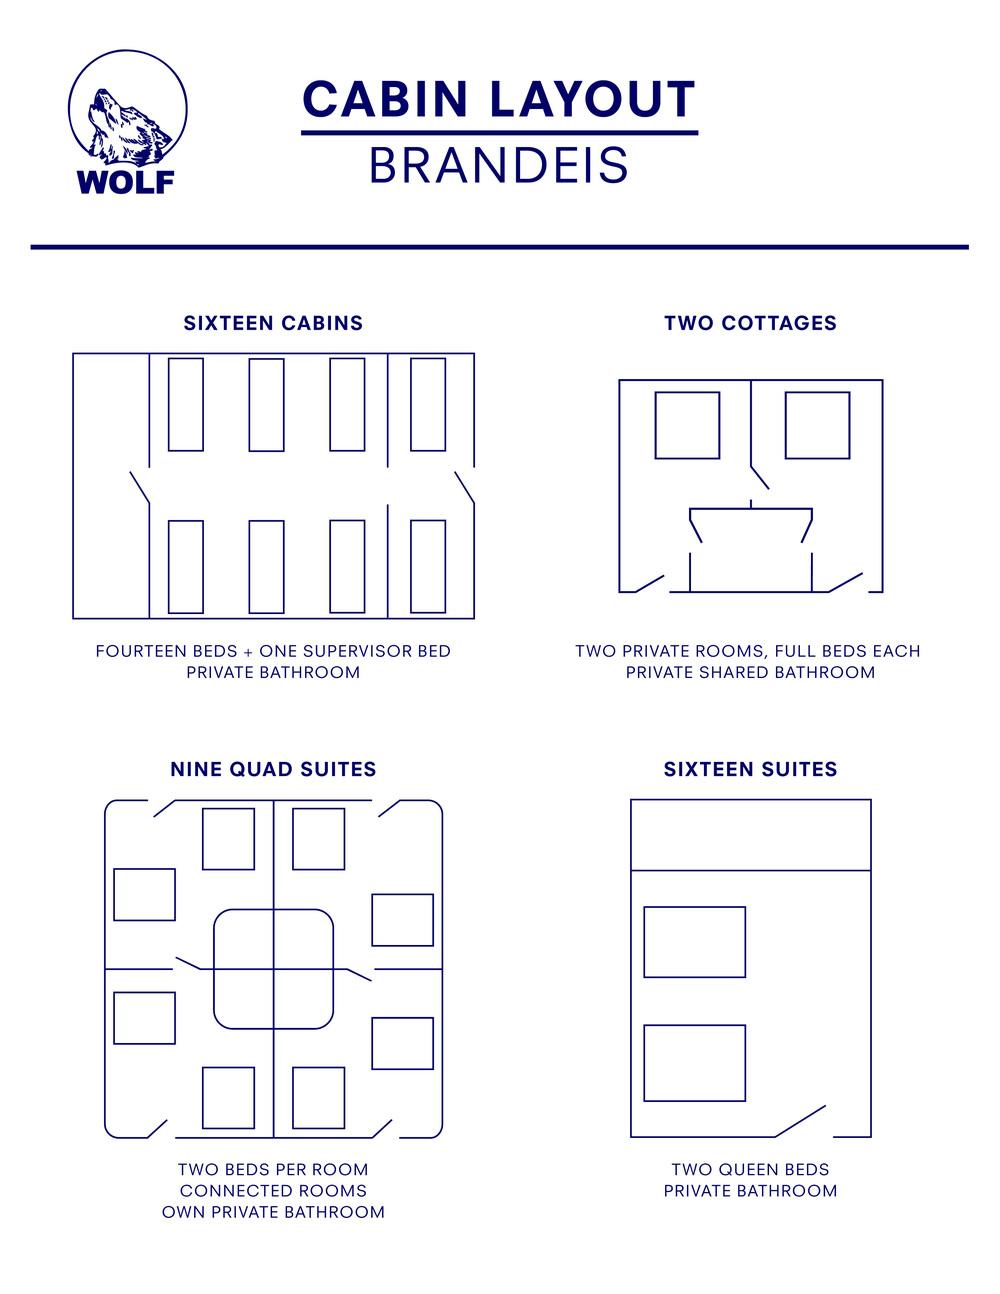 BRANDEIS-layout.jpg